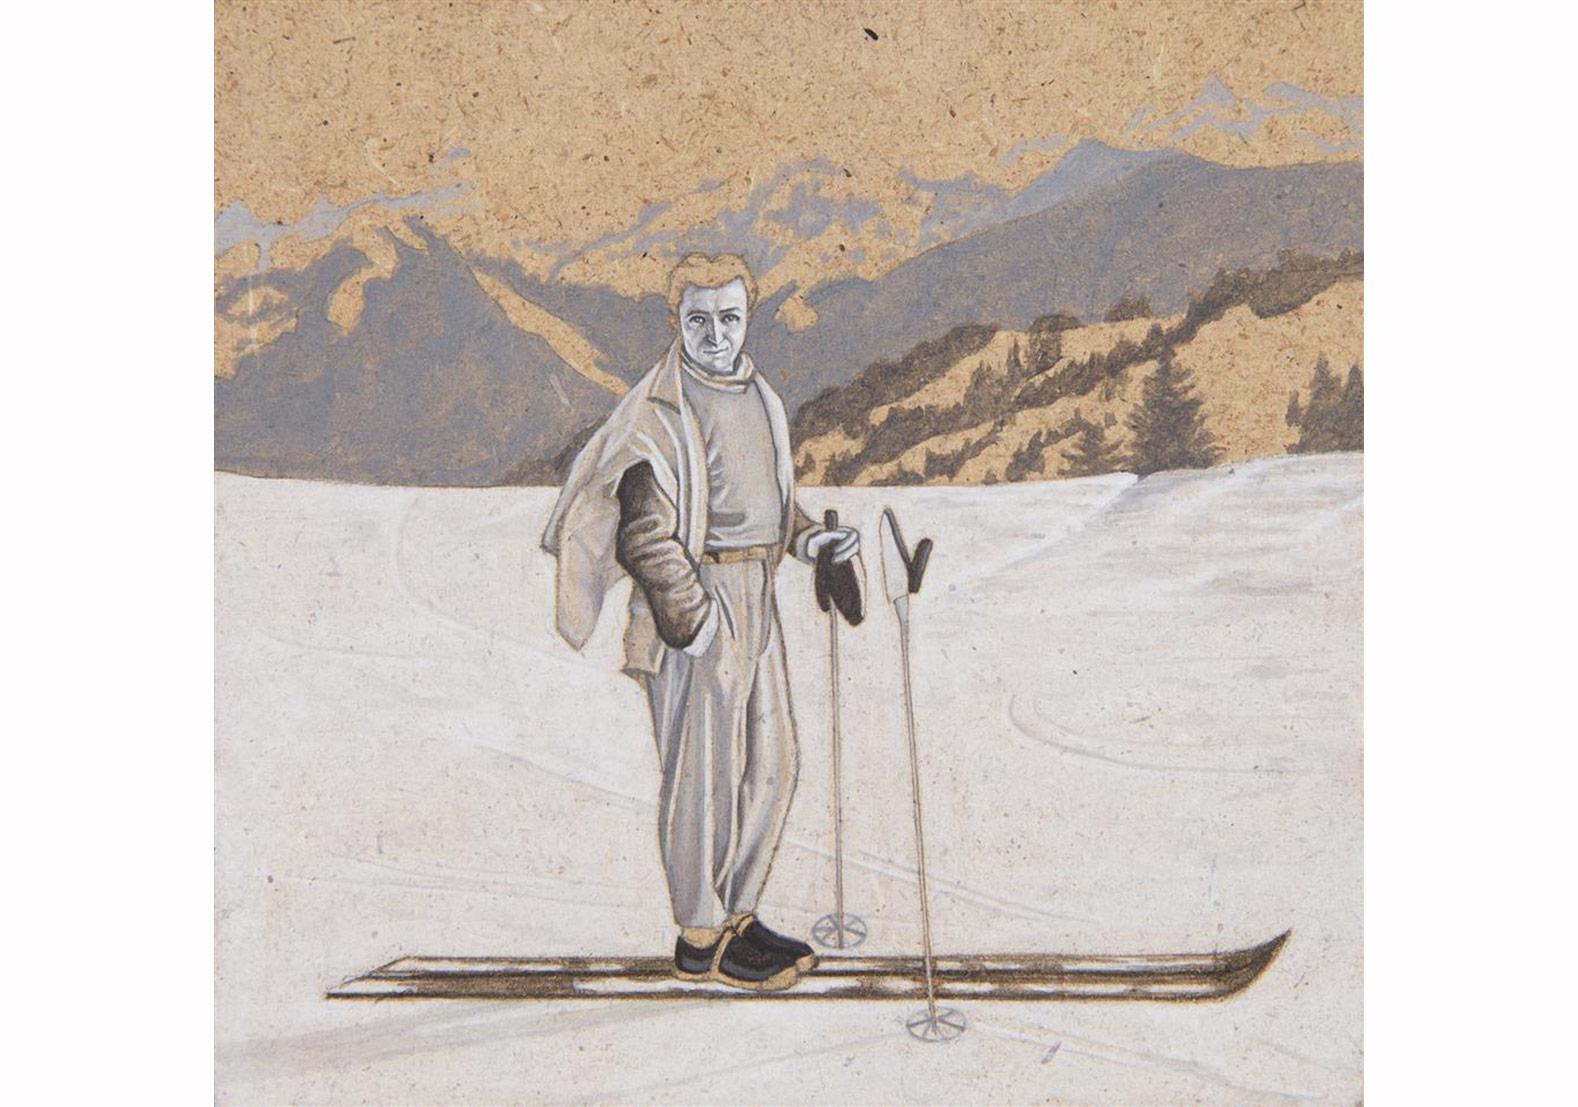 Kar, 2014 © Gülşah Bayraktar, Mixer izniyle